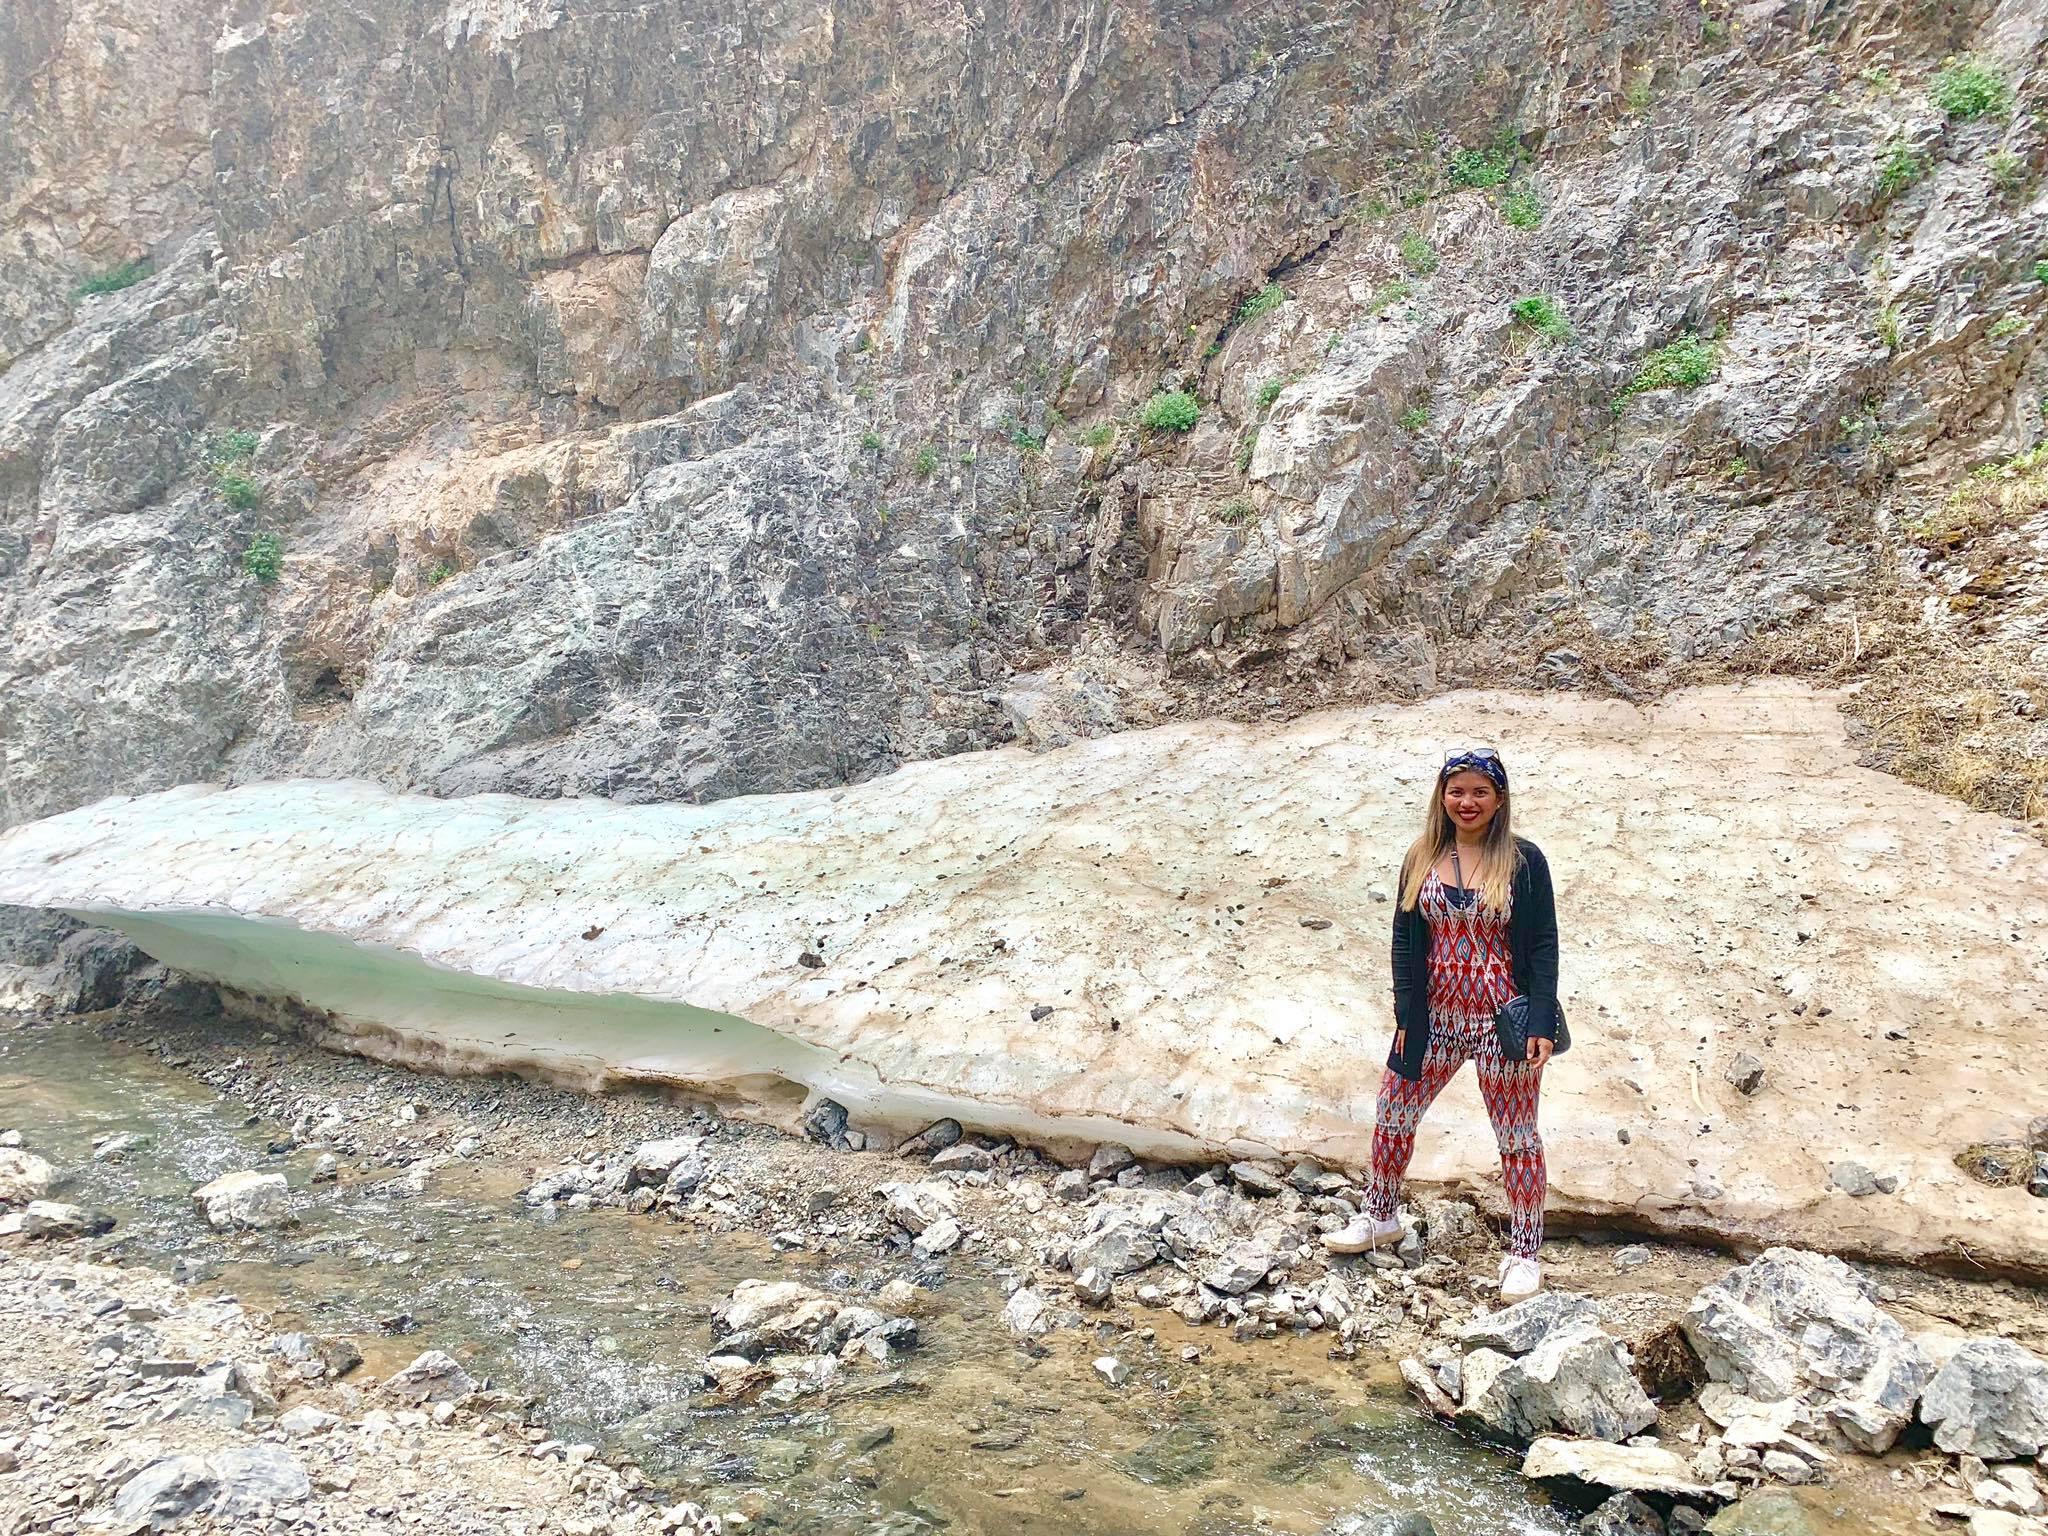 Kach Solo Travels in 2019 Horseback riding trip to the Gobi Gurvan Saikhan National Park26.jpg